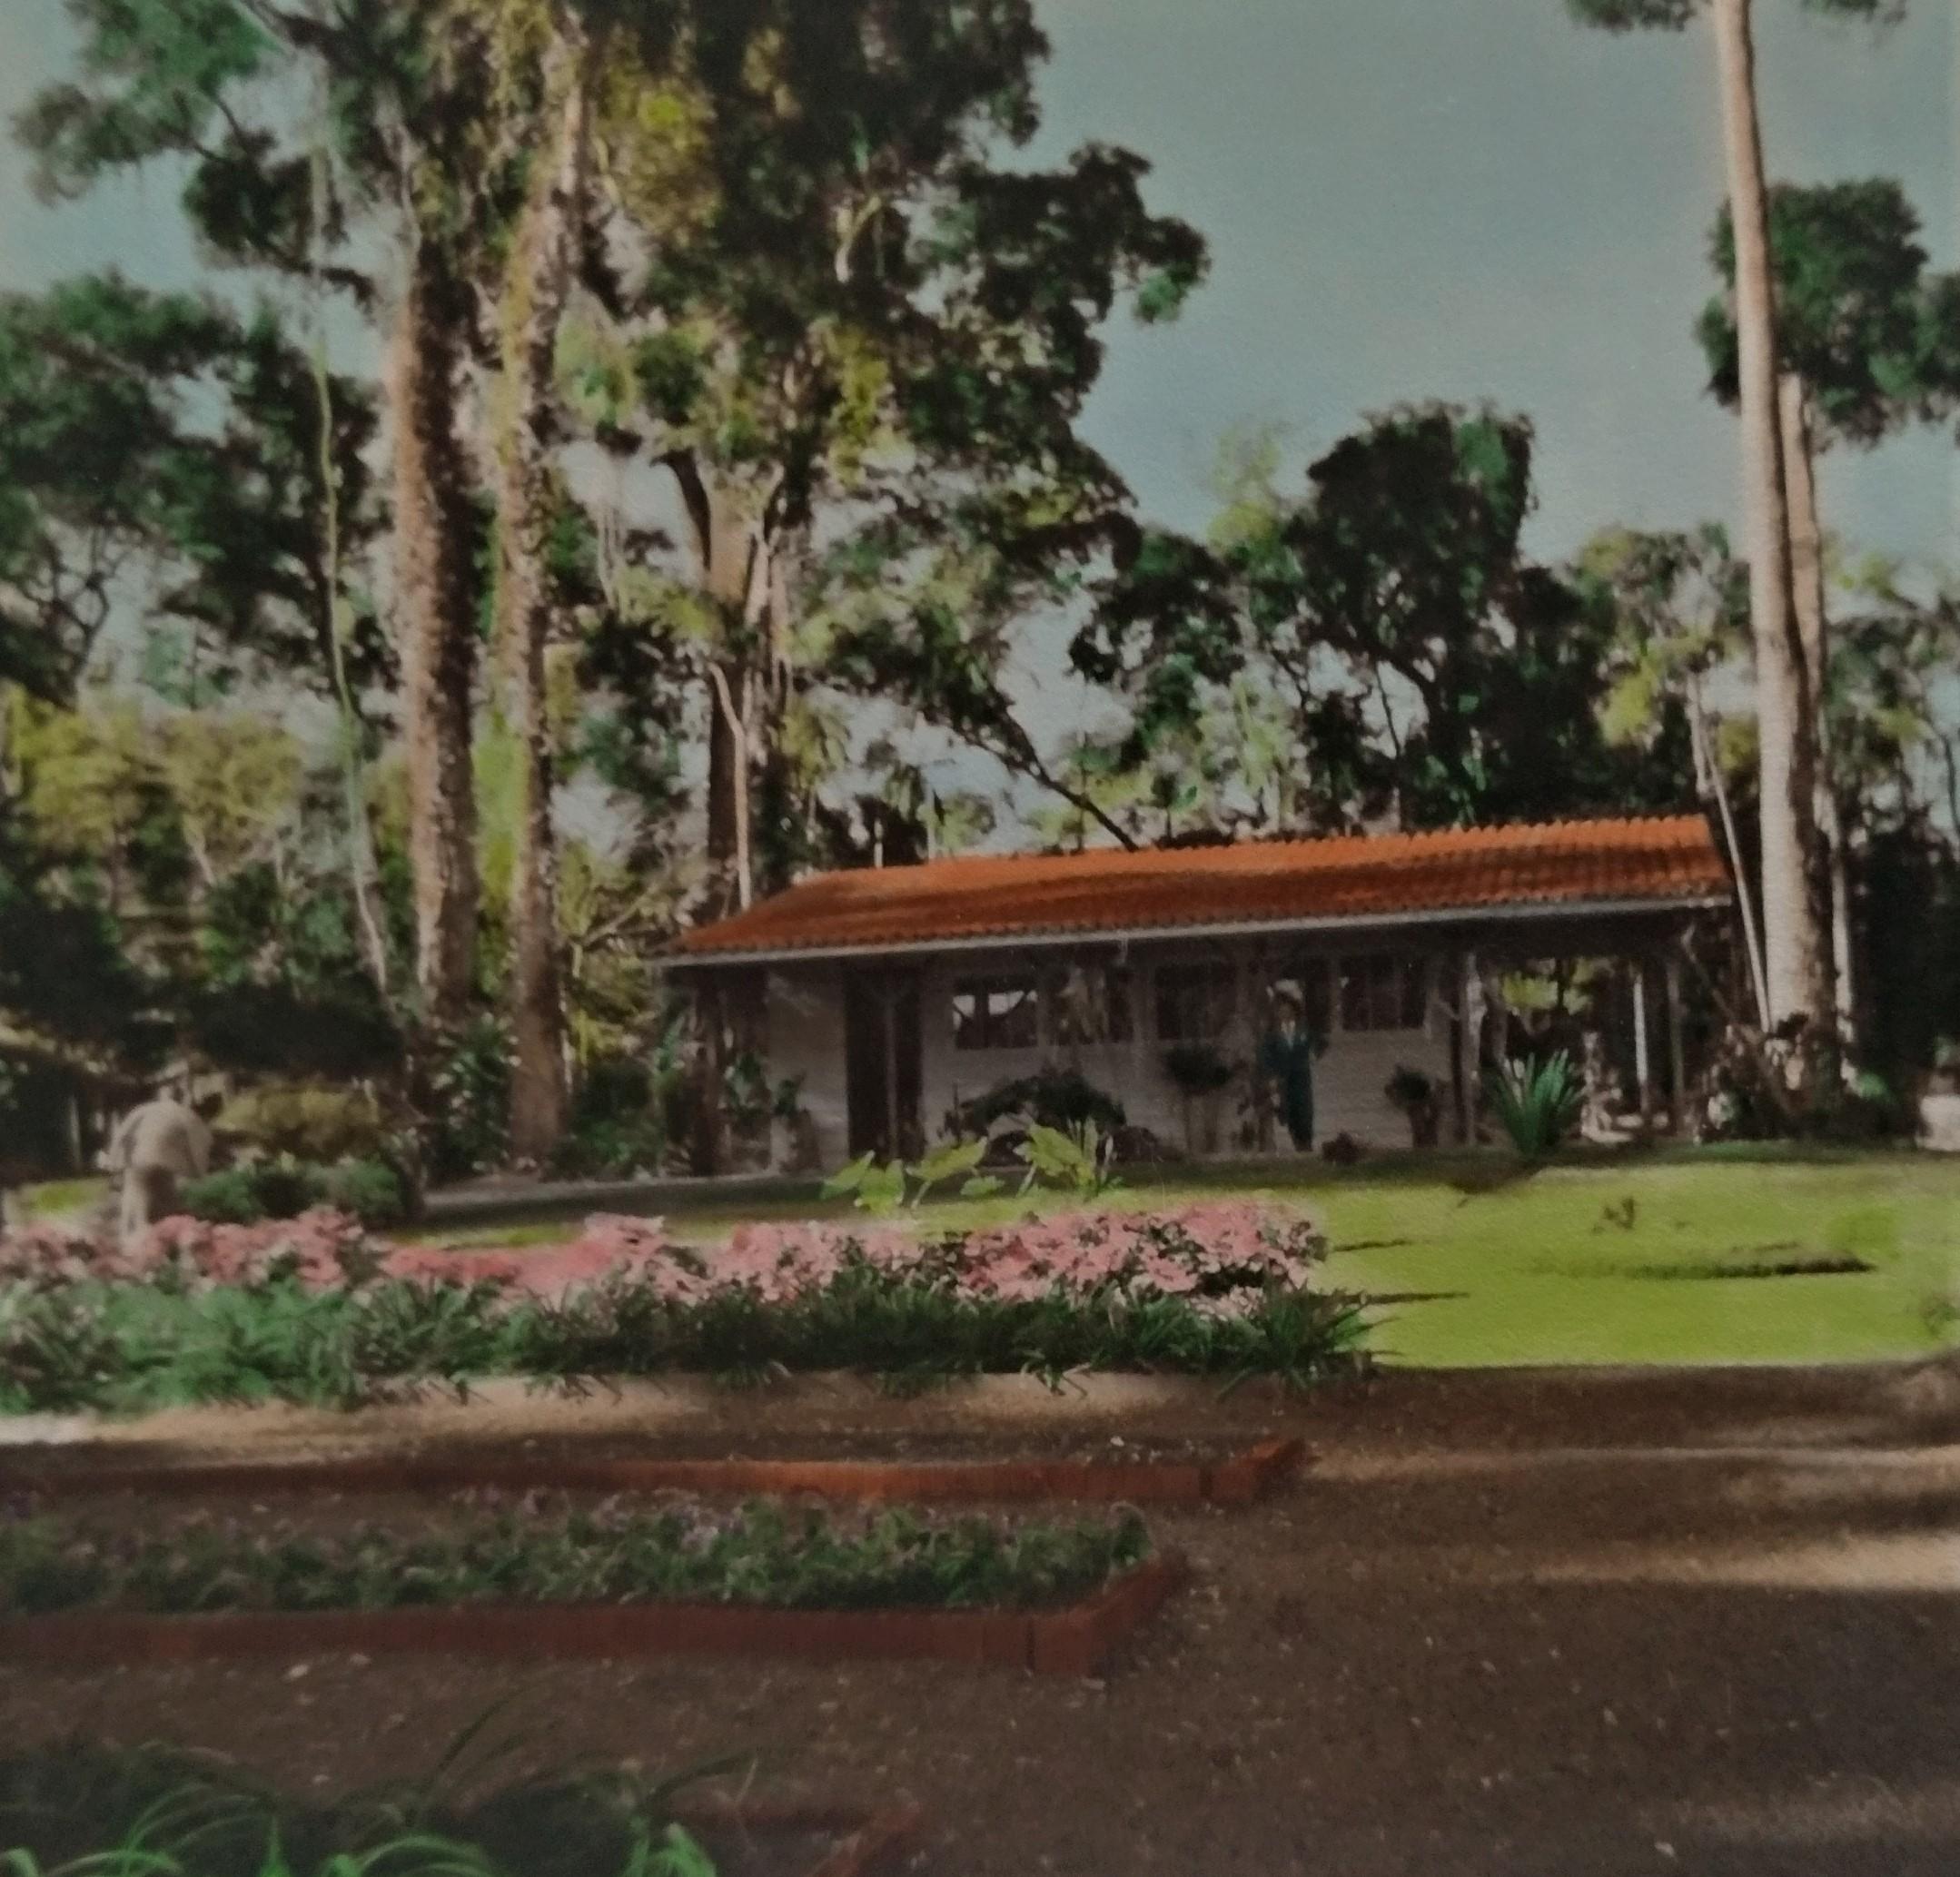 Joubert de Carvalho no Horto Florestal - 1959